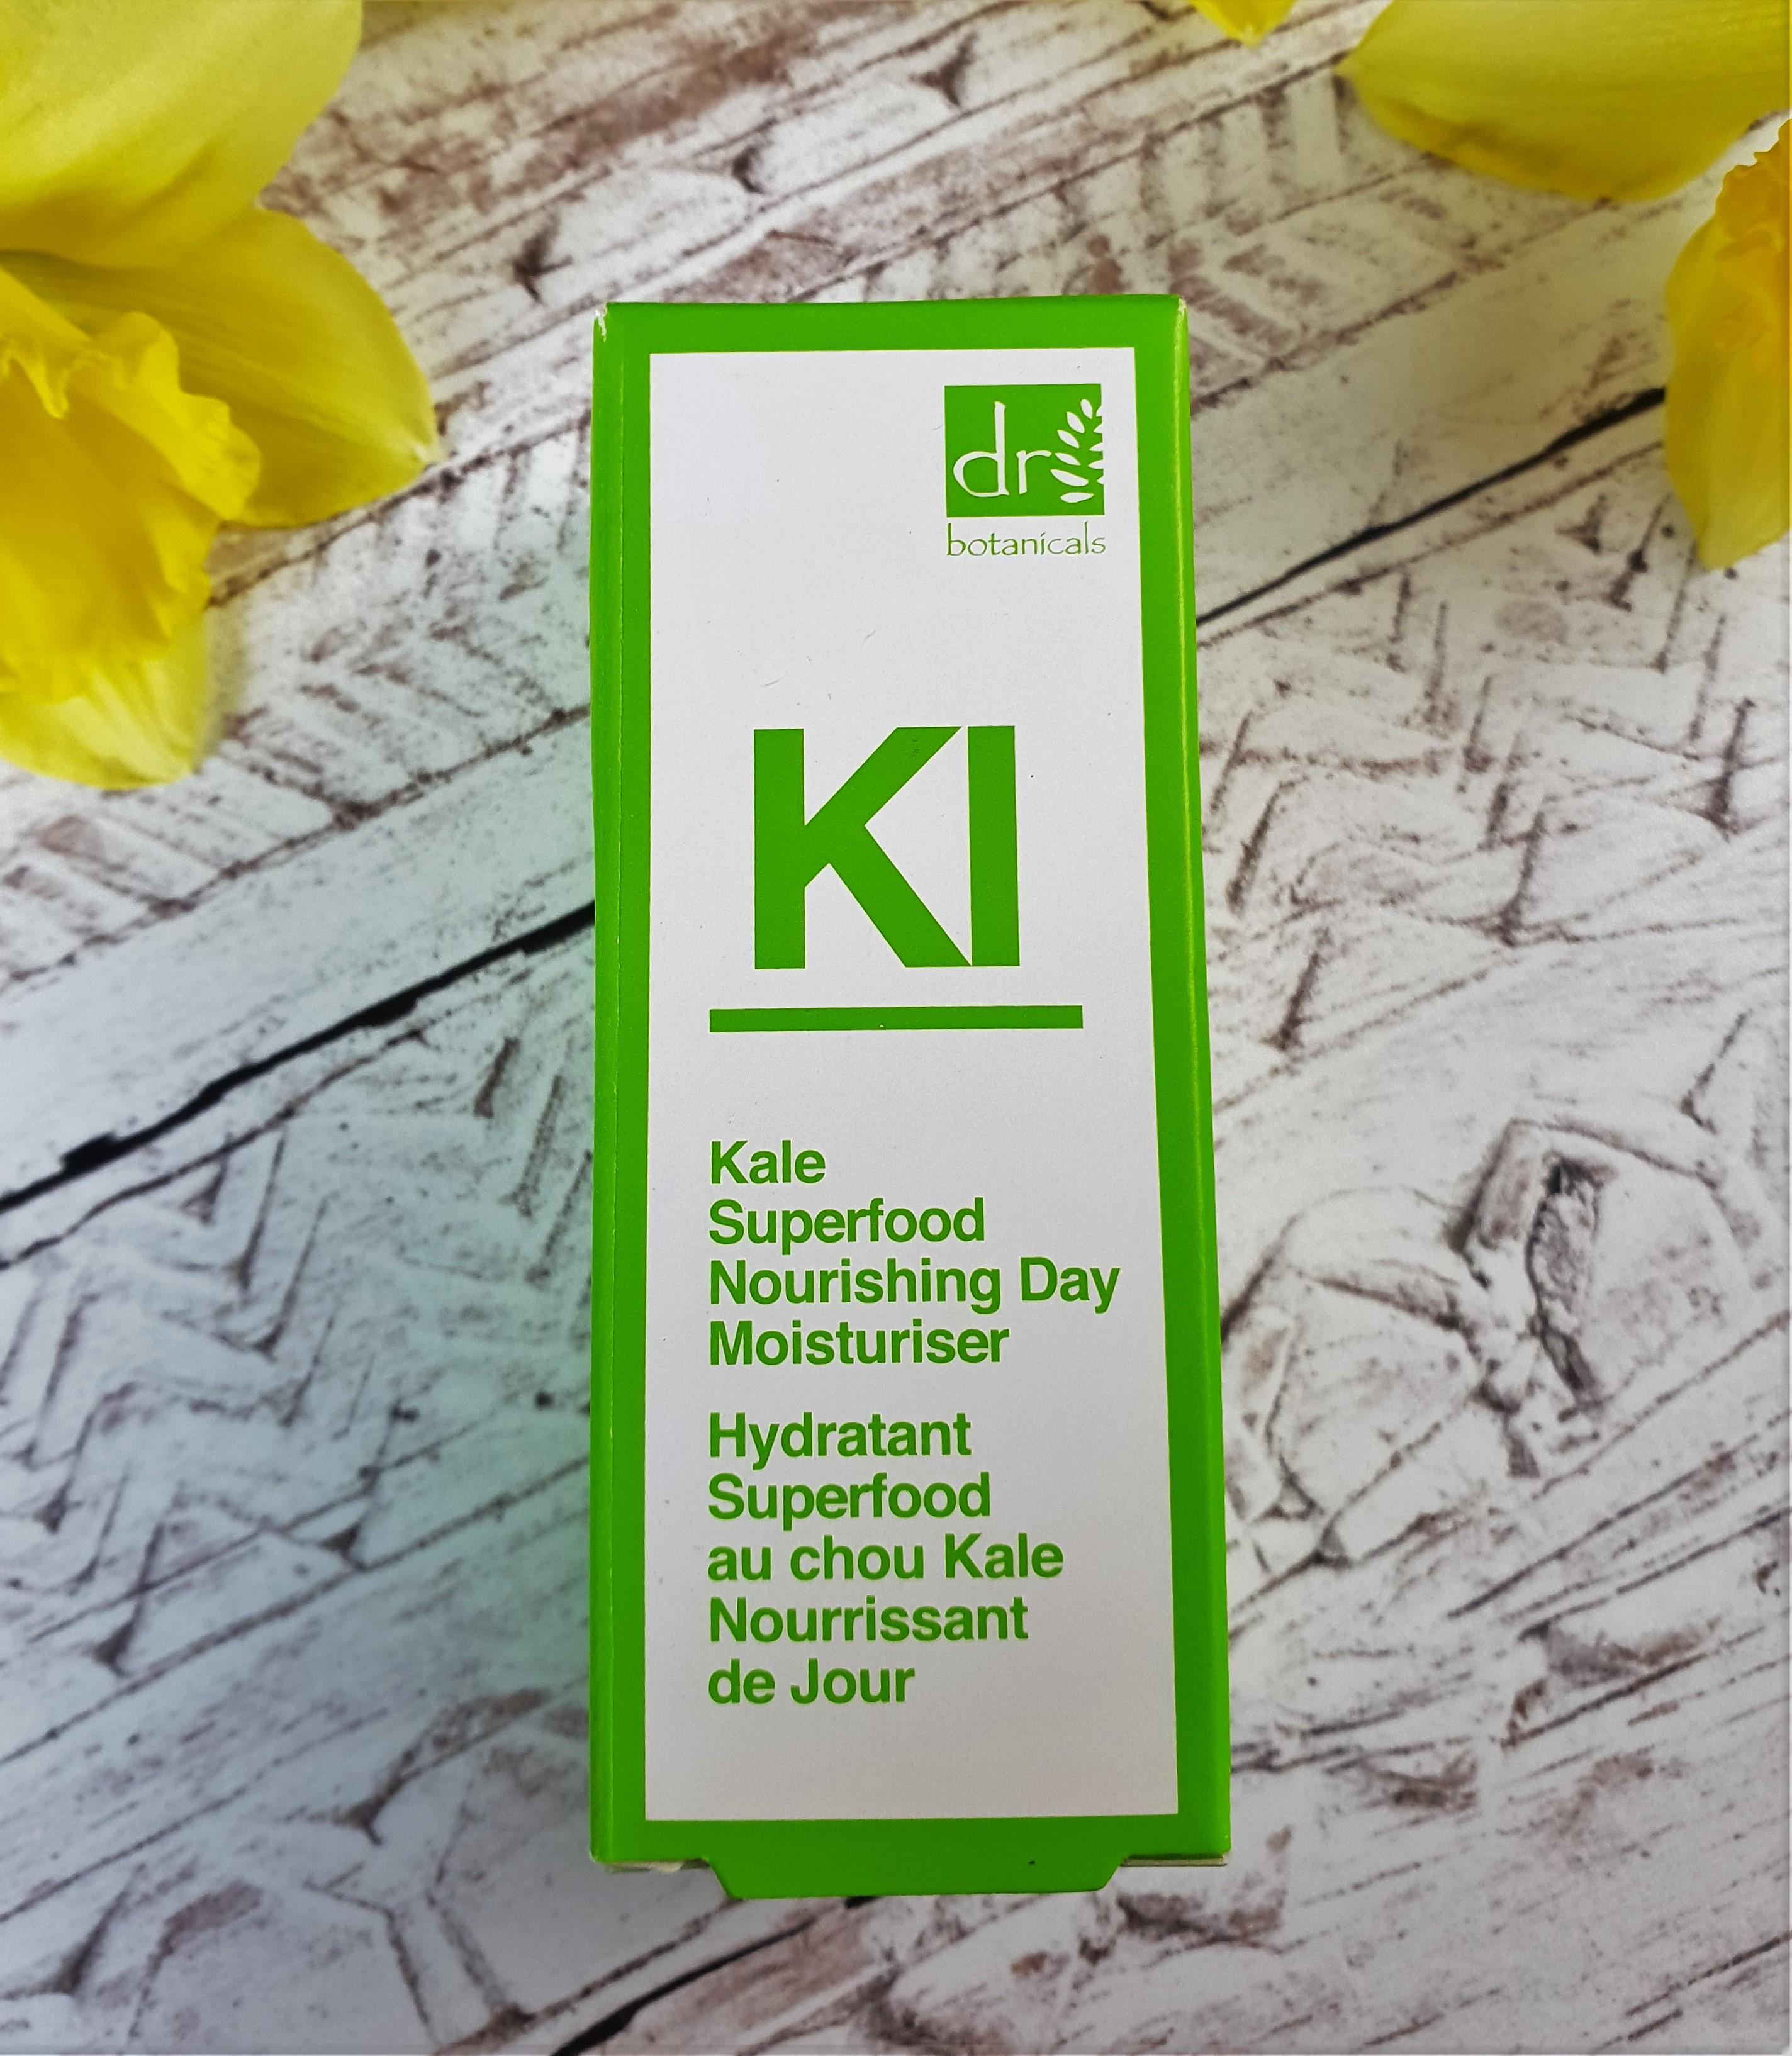 Dr.botanicals Kale Superfood Nourishing Day Moisturiser 30ml